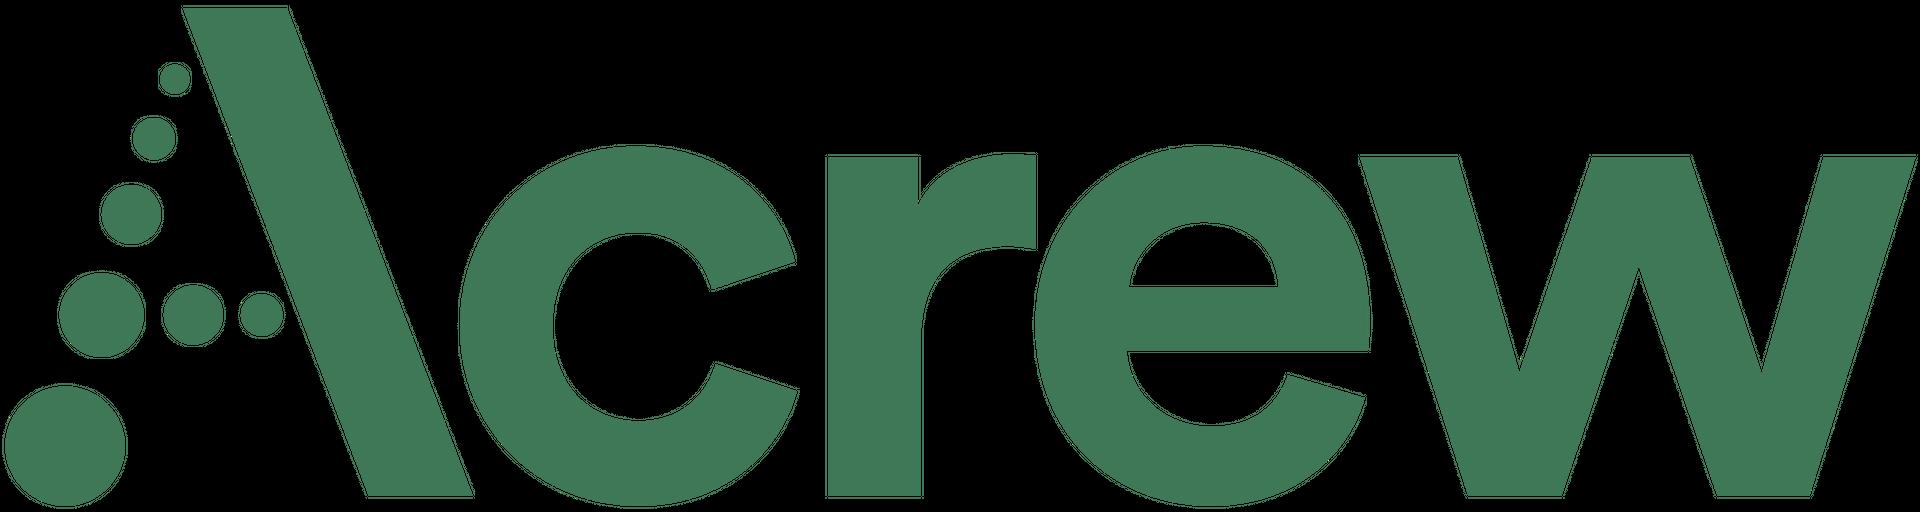 Acrew Capital logo